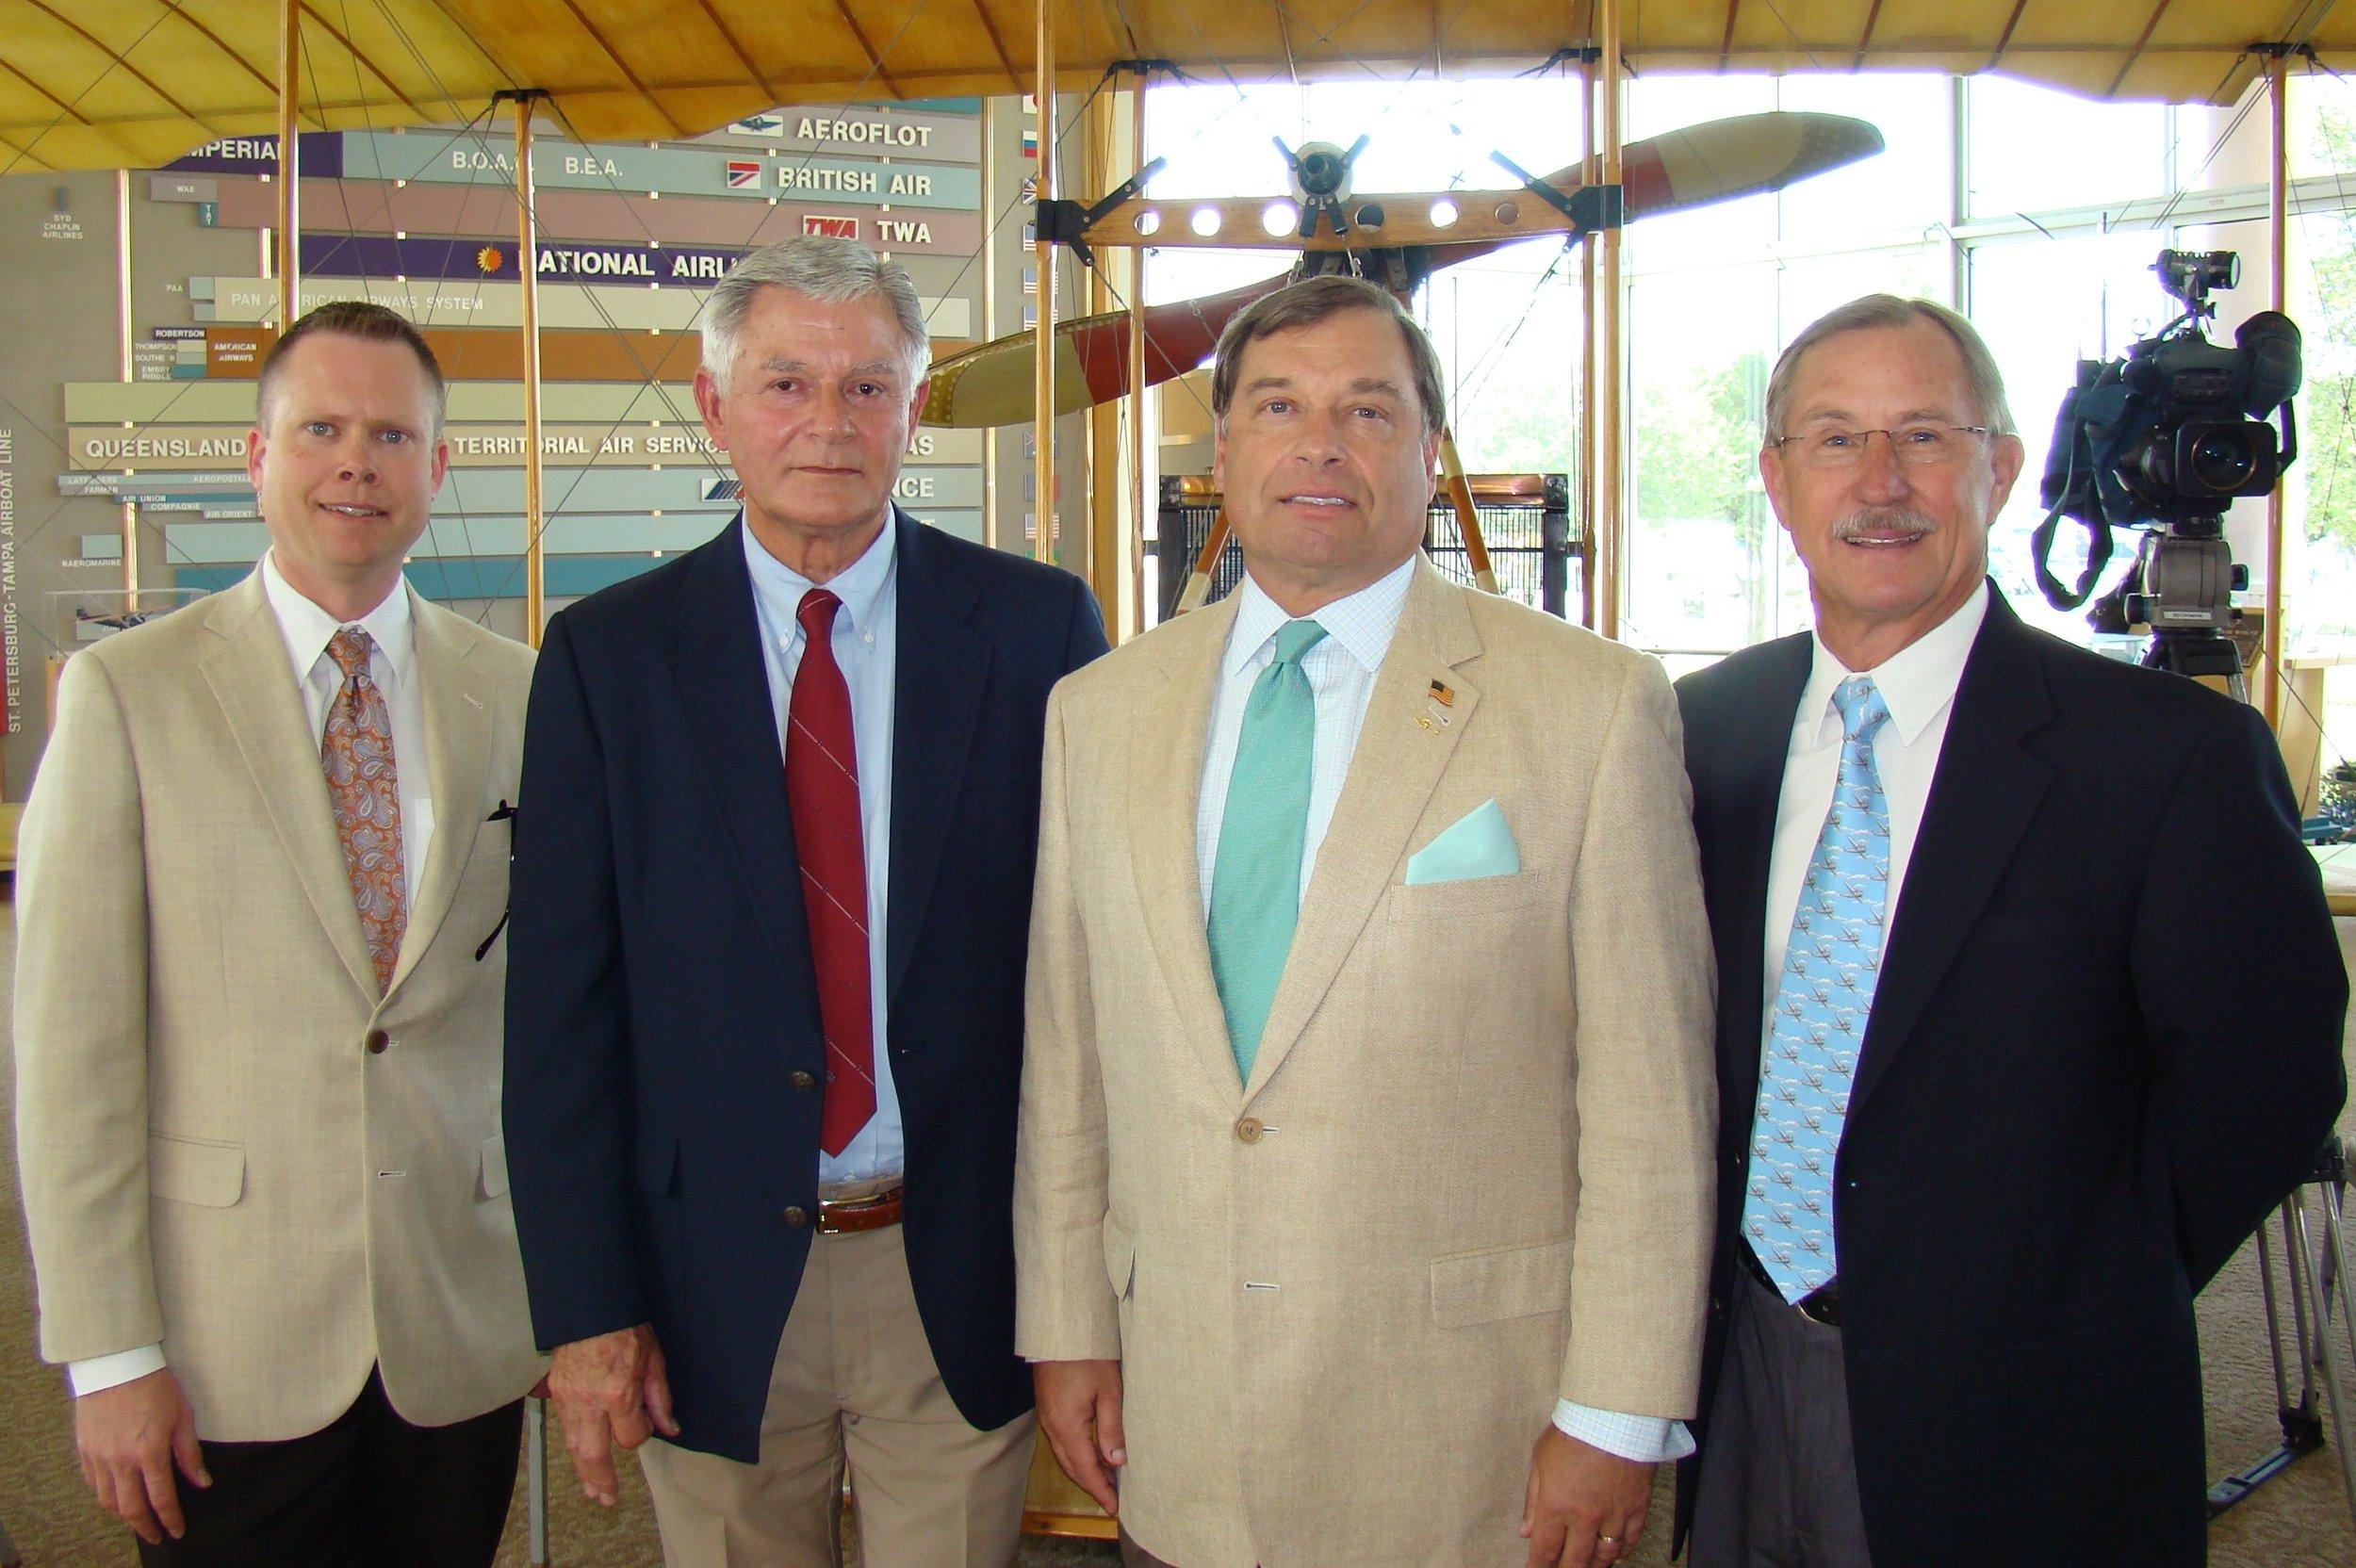 Chris Minner, Bob Knight, Tanker Snyder & John 'Lites Leenhouts - 2, 14 Jun '12.JPG